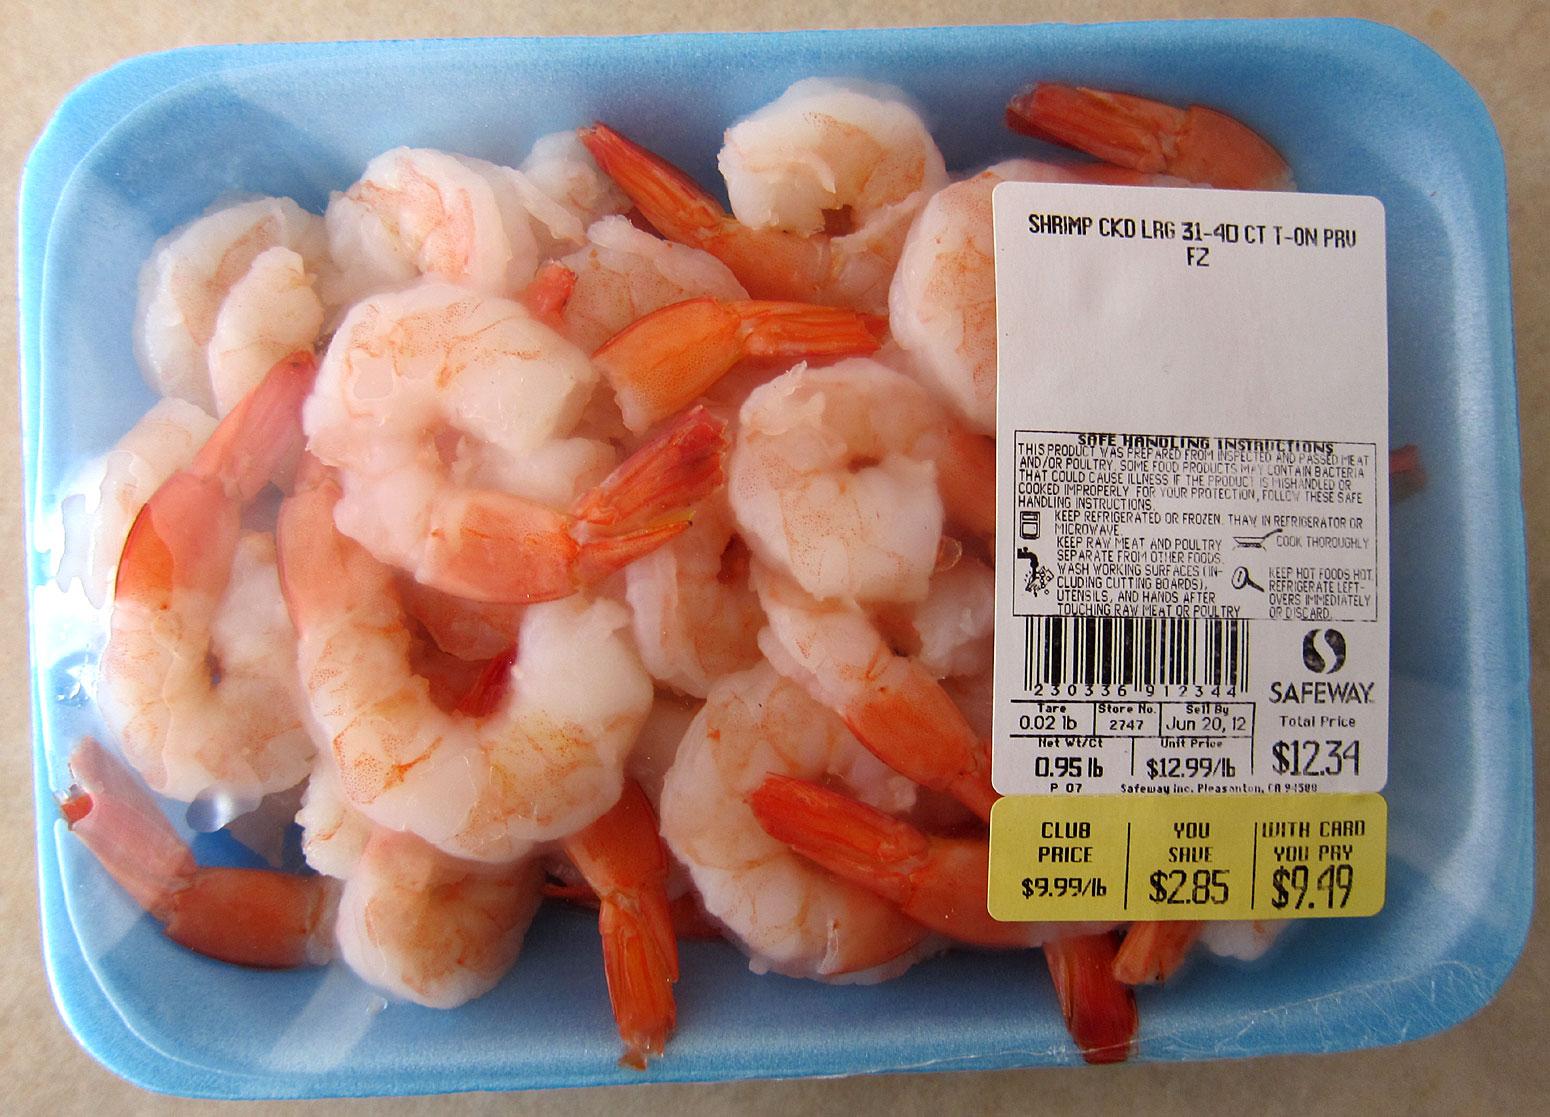 Shrimp cocktail tasty island - Defrost chicken safe way ...